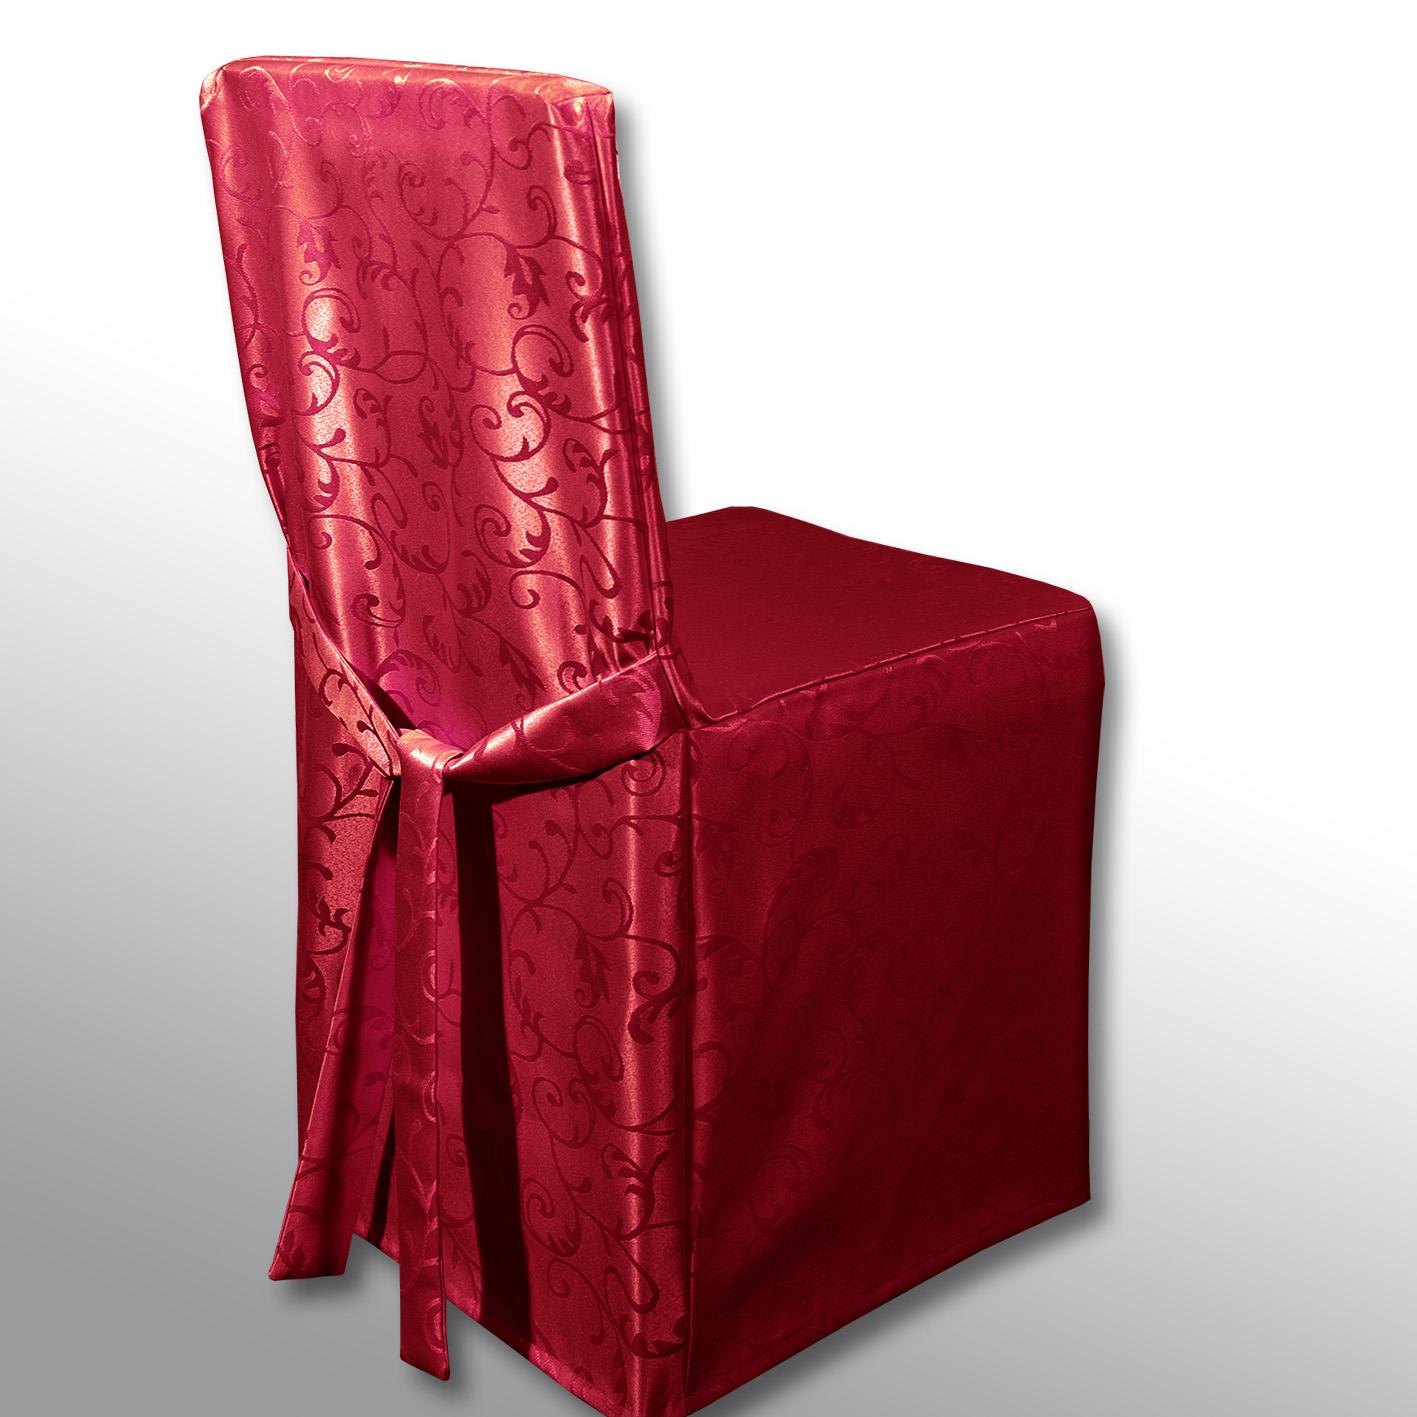 Чехол на стул «Schaefer», цвет: красный, 45 х 45 х 45 см  куплю бу двухъярусную диван кровать